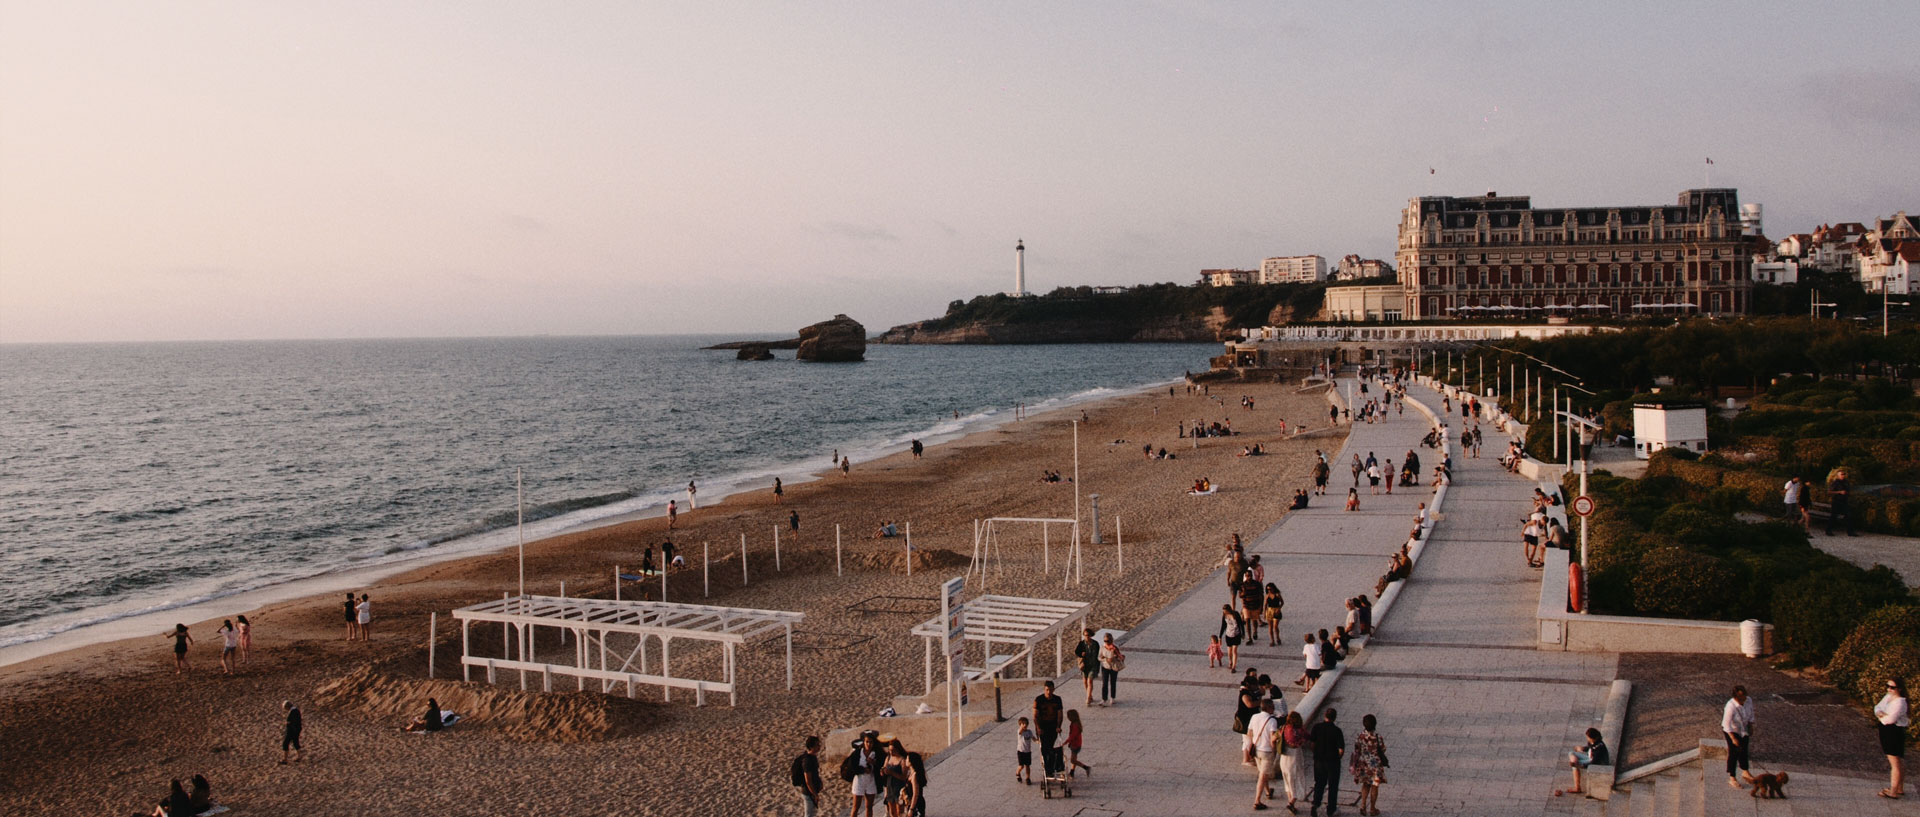 Natasha & Jad Wedding - Casino Biarritz (6).jpg